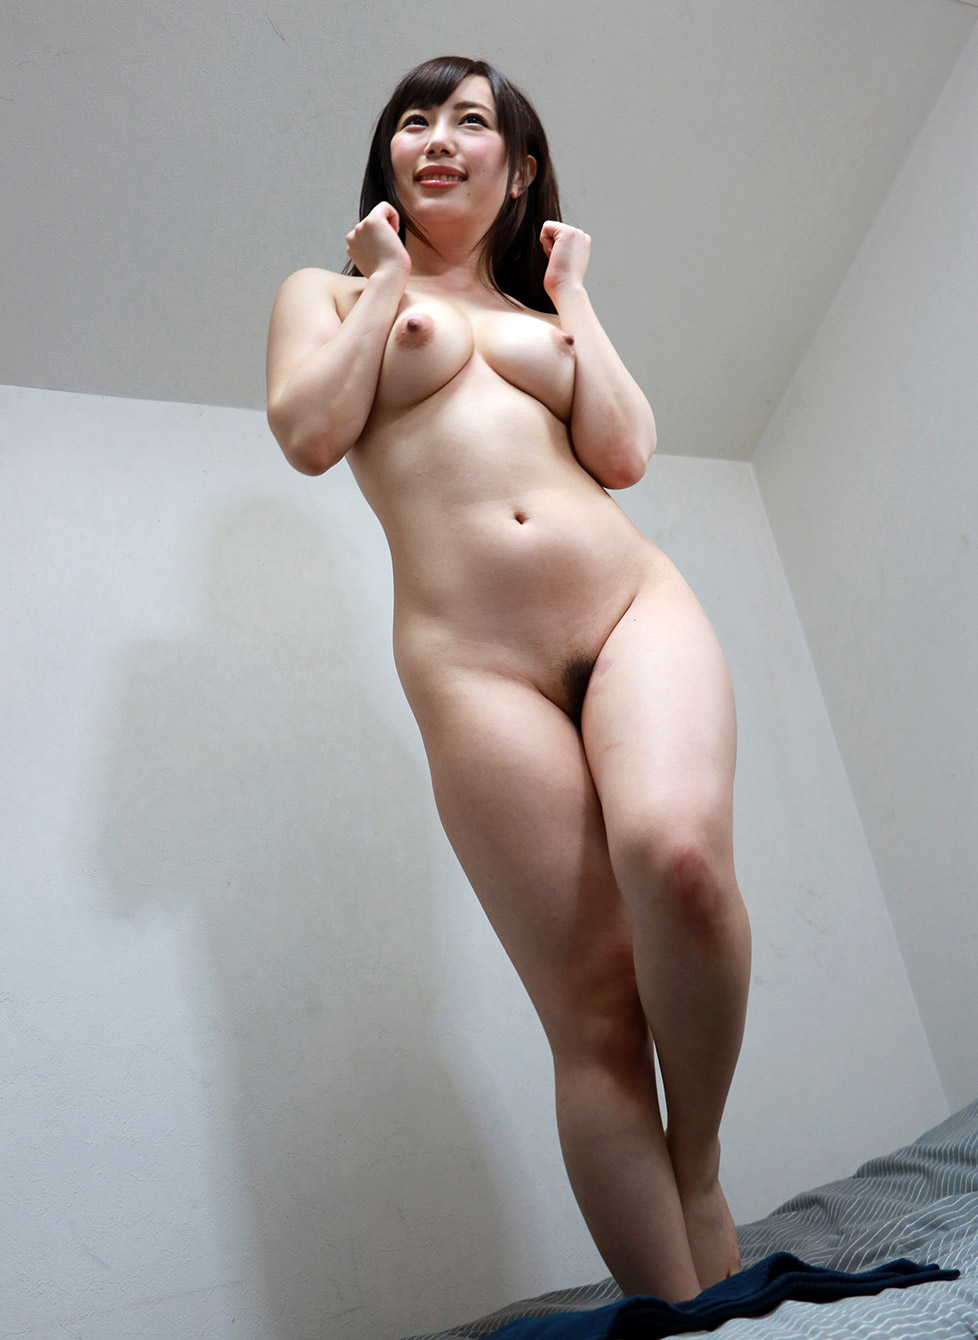 Alycetn Porn Gif gallery sexgram porn movies tubetubetube jav porn pics 絶妙